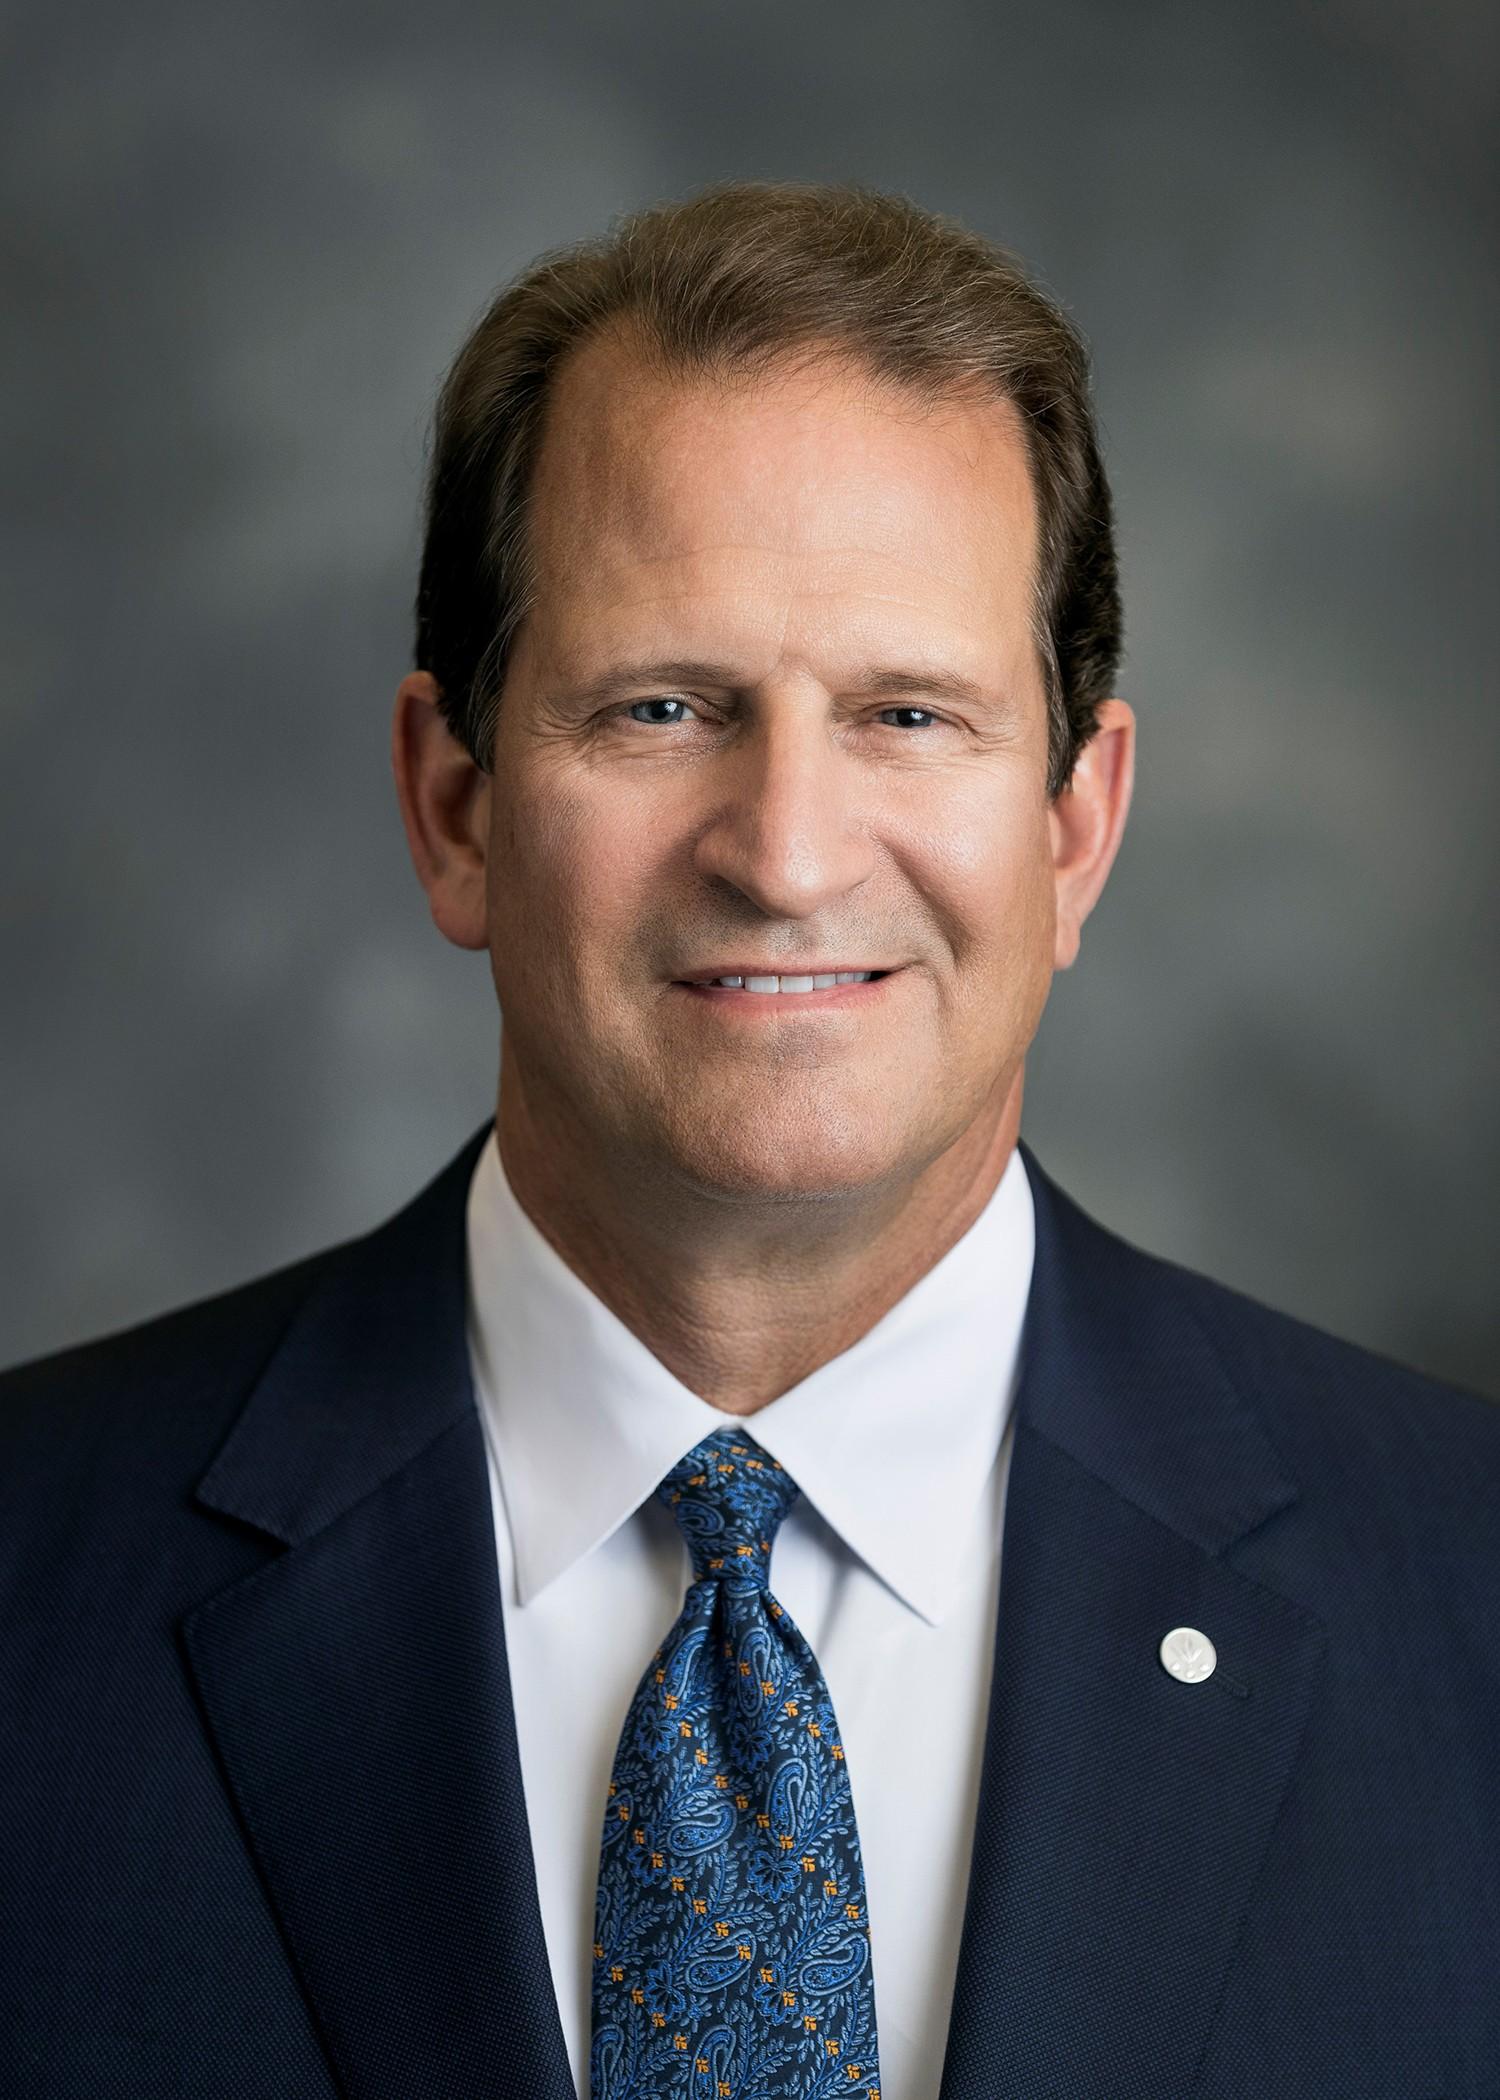 Mr. David T. Seaton